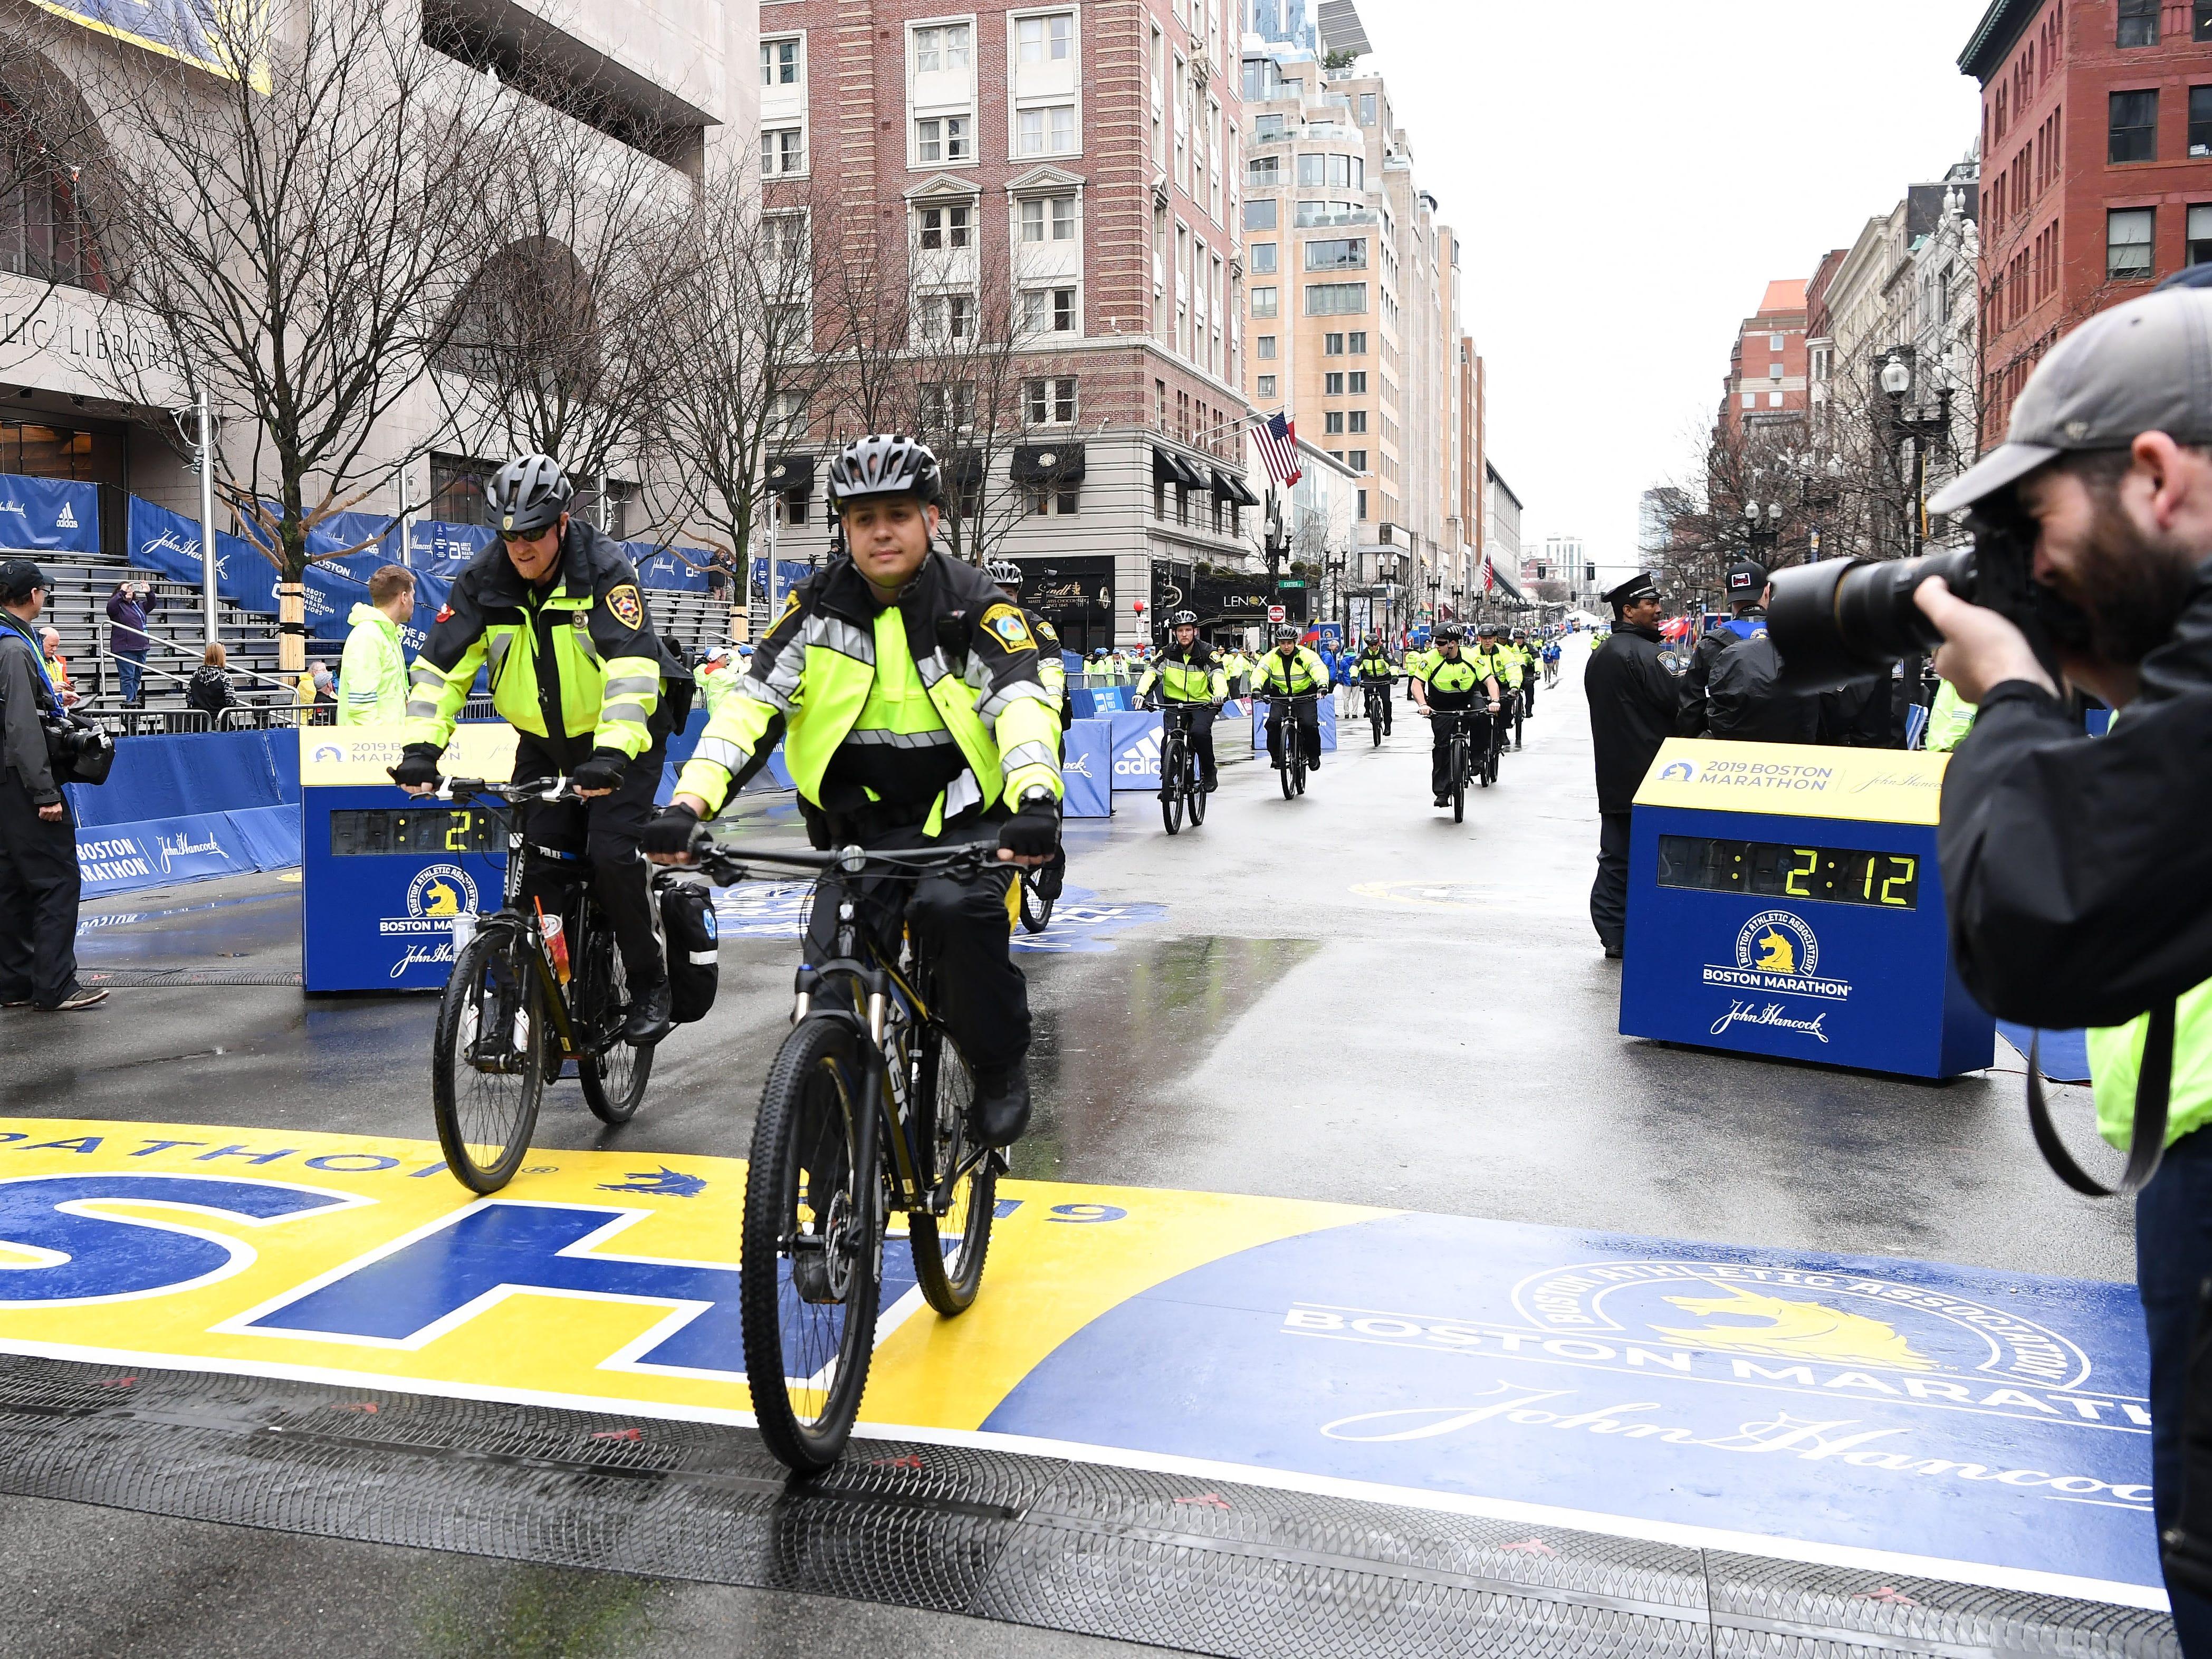 Boston police cross the finish line ahead of the 2019 Boston Marathon.